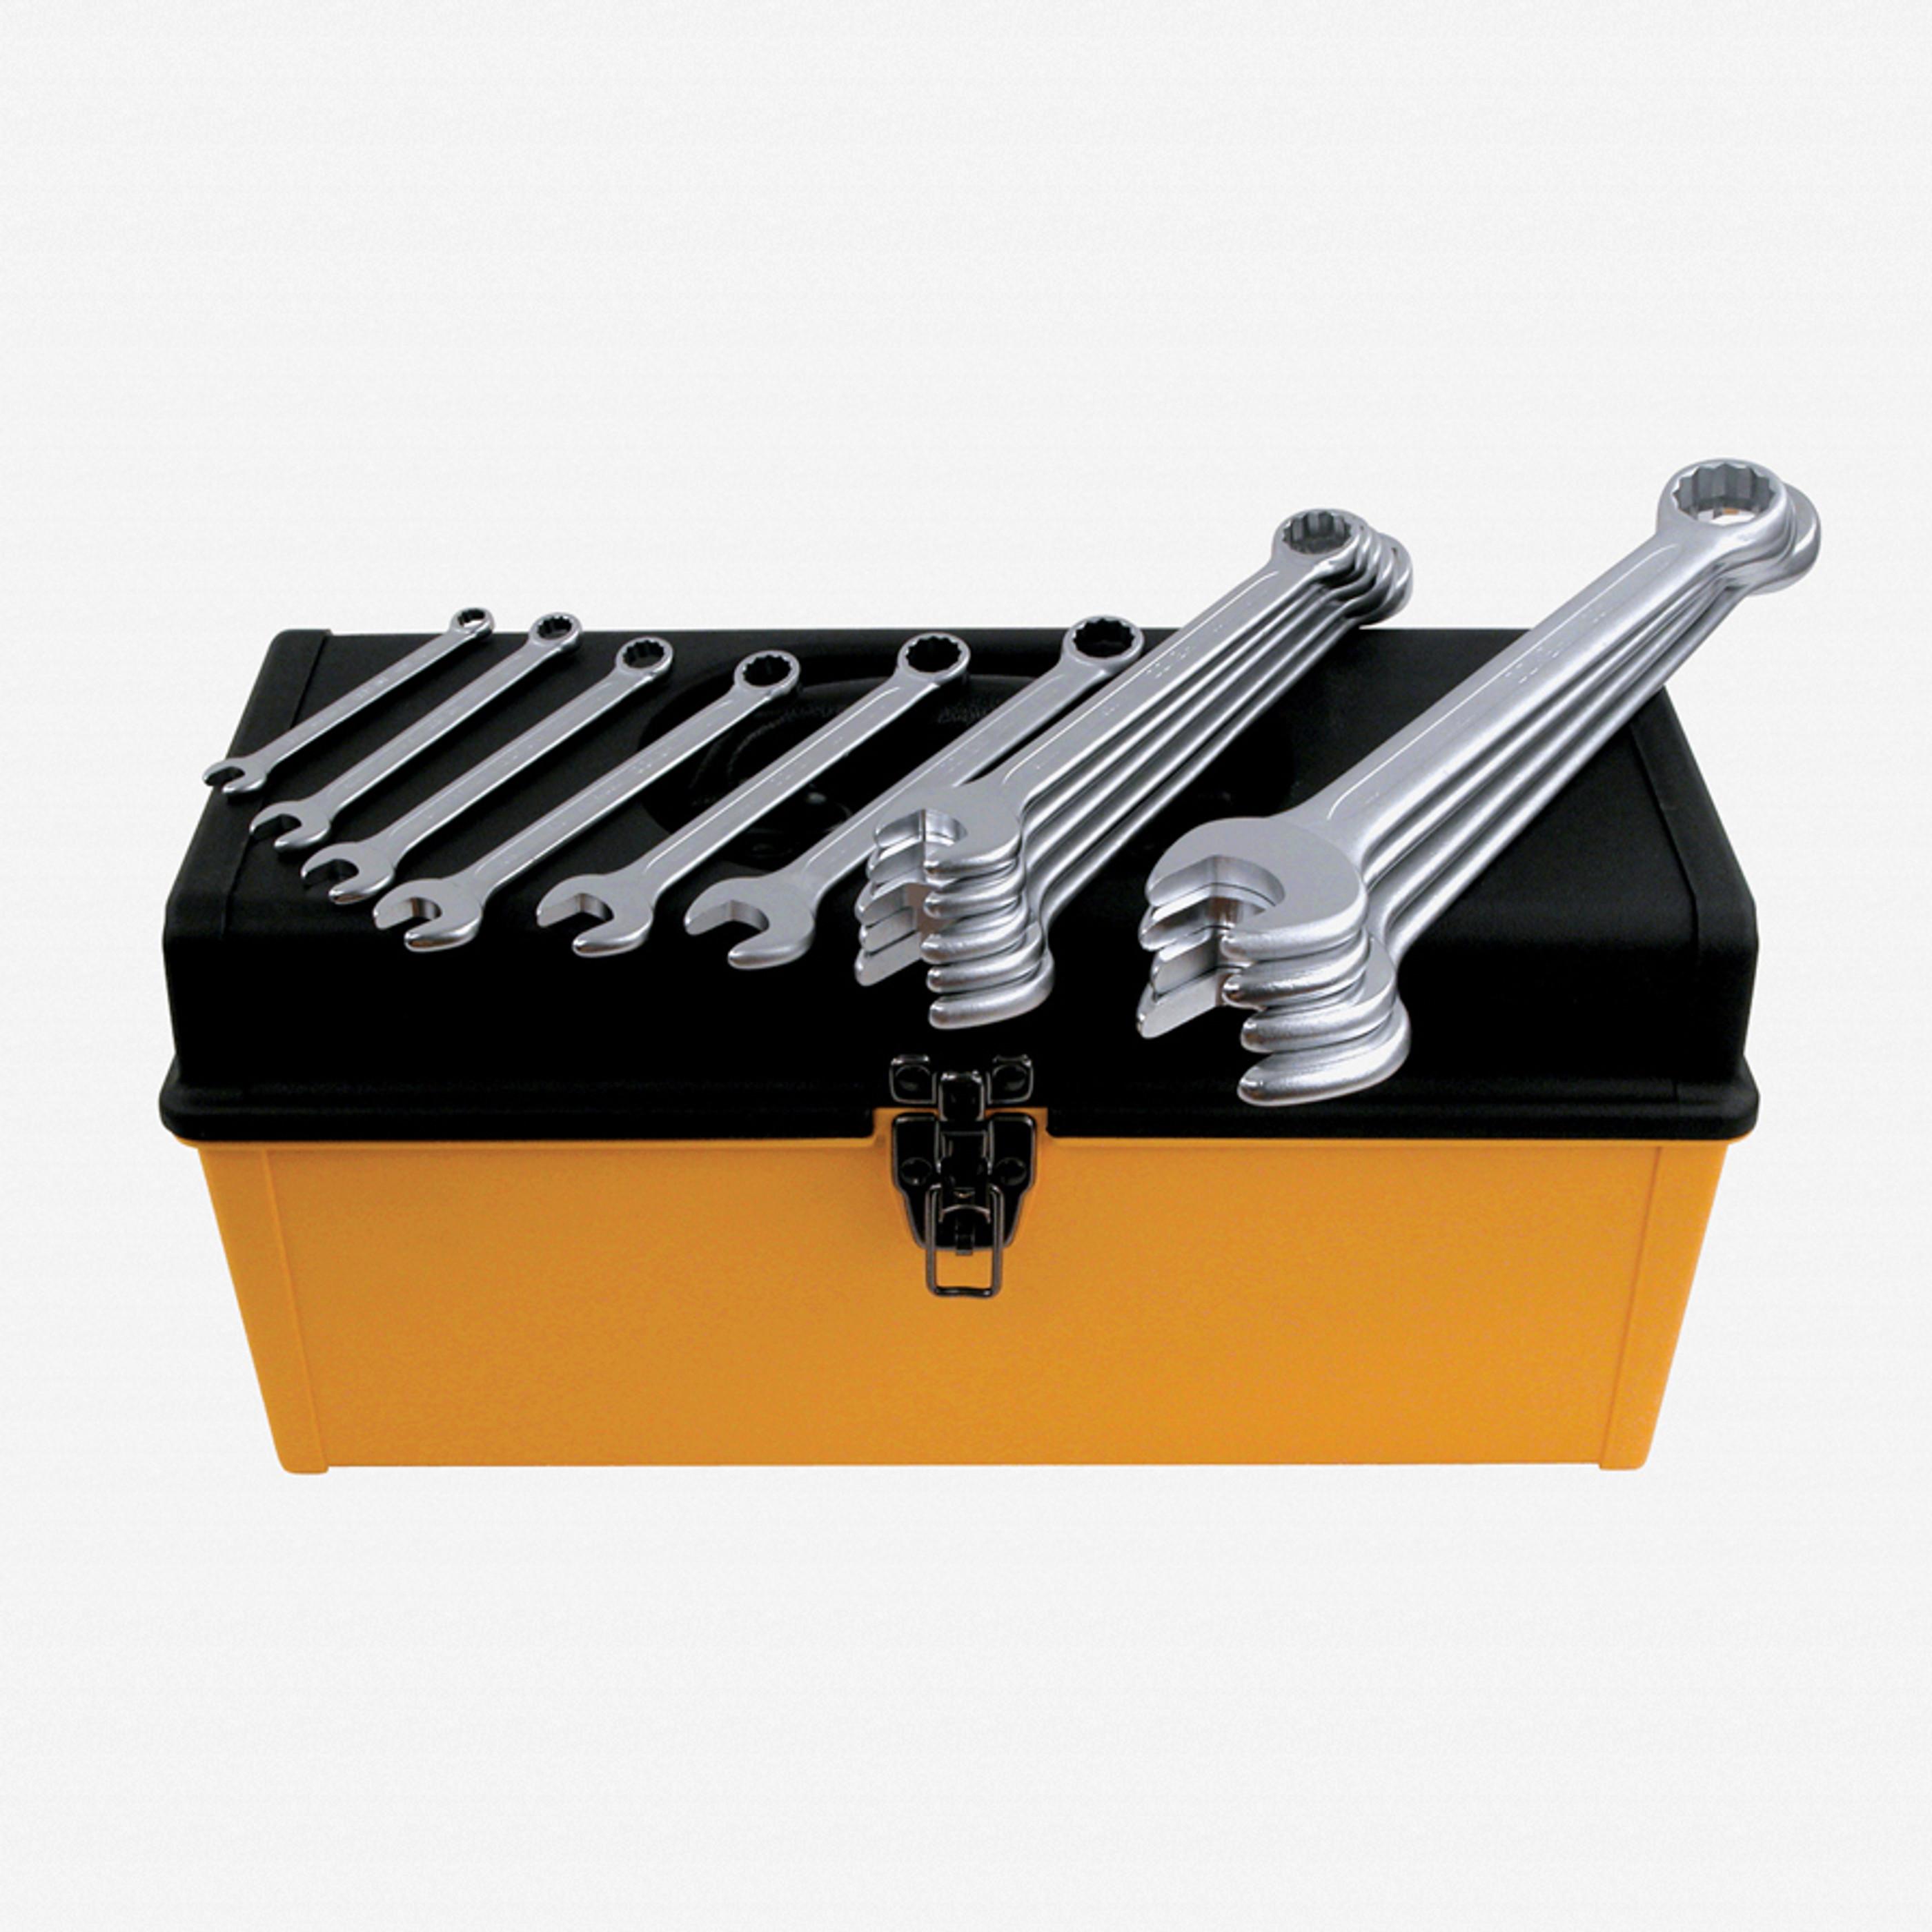 Heyco) 40096 15 Piece Metric Combination Wrench Tool Box Set - KC Tool